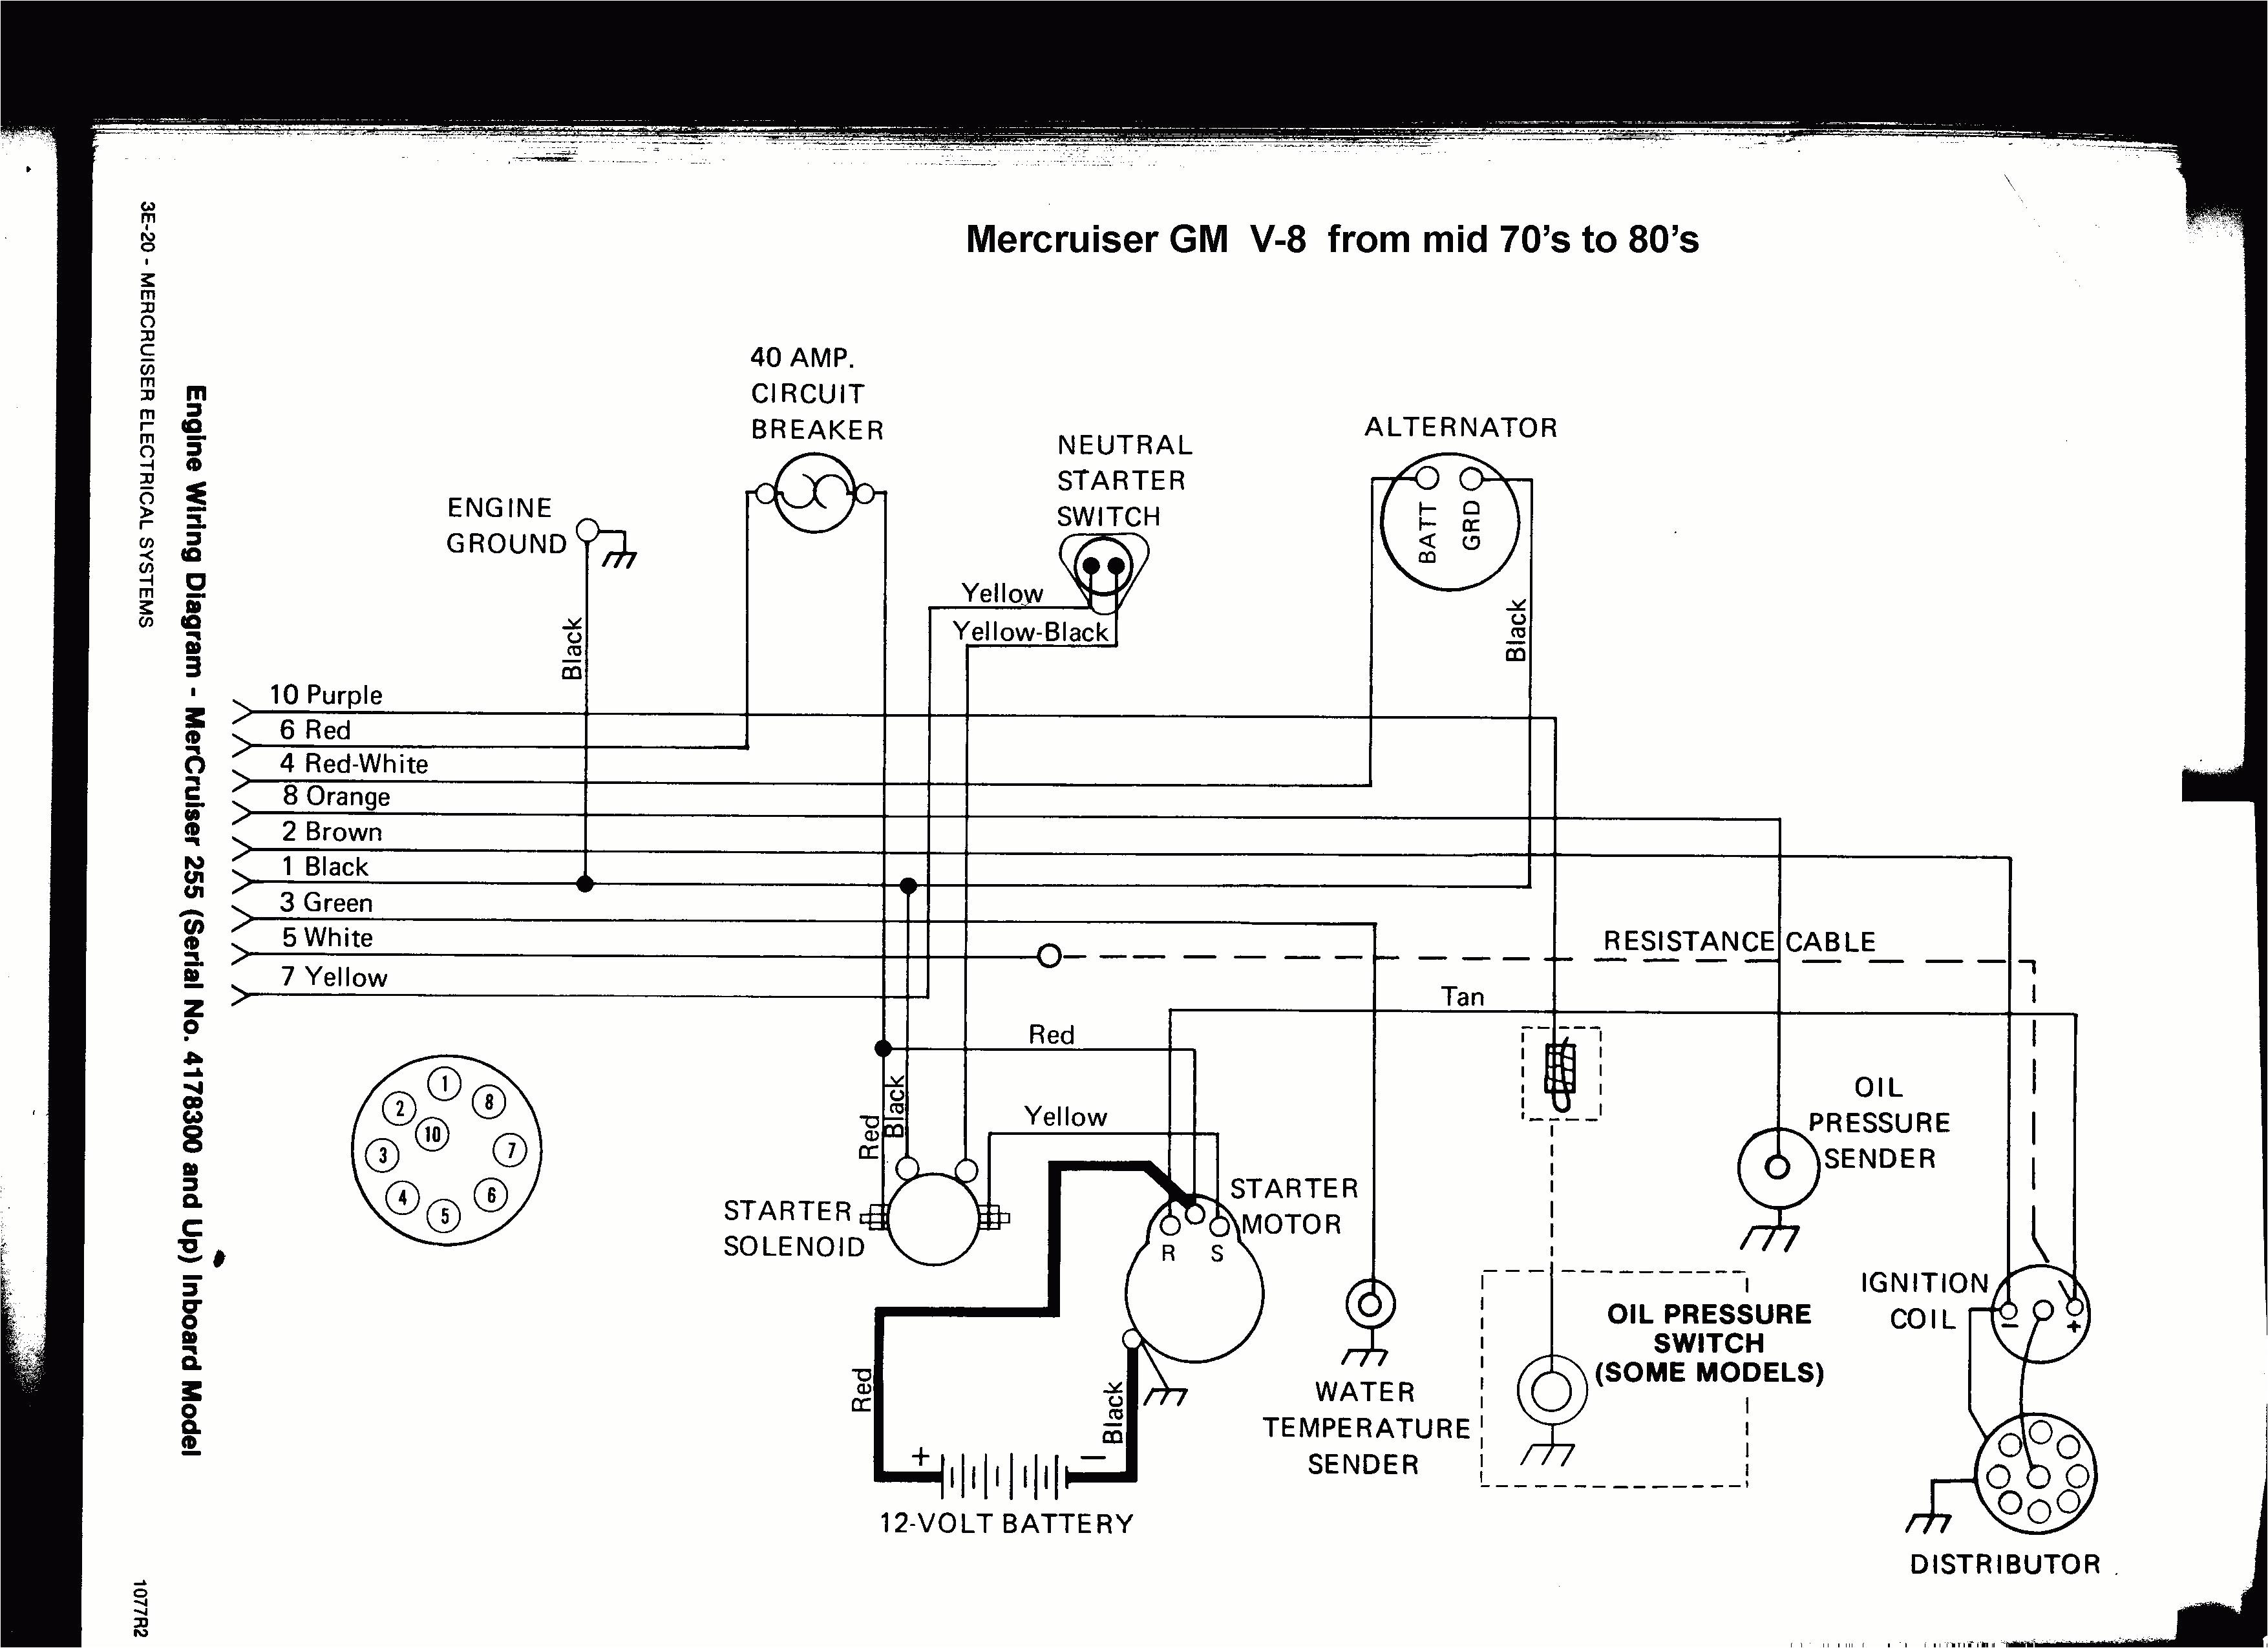 volvo penta 3 0 engine diagram wiring diagram used 3 0 volvo penta wiring diagram